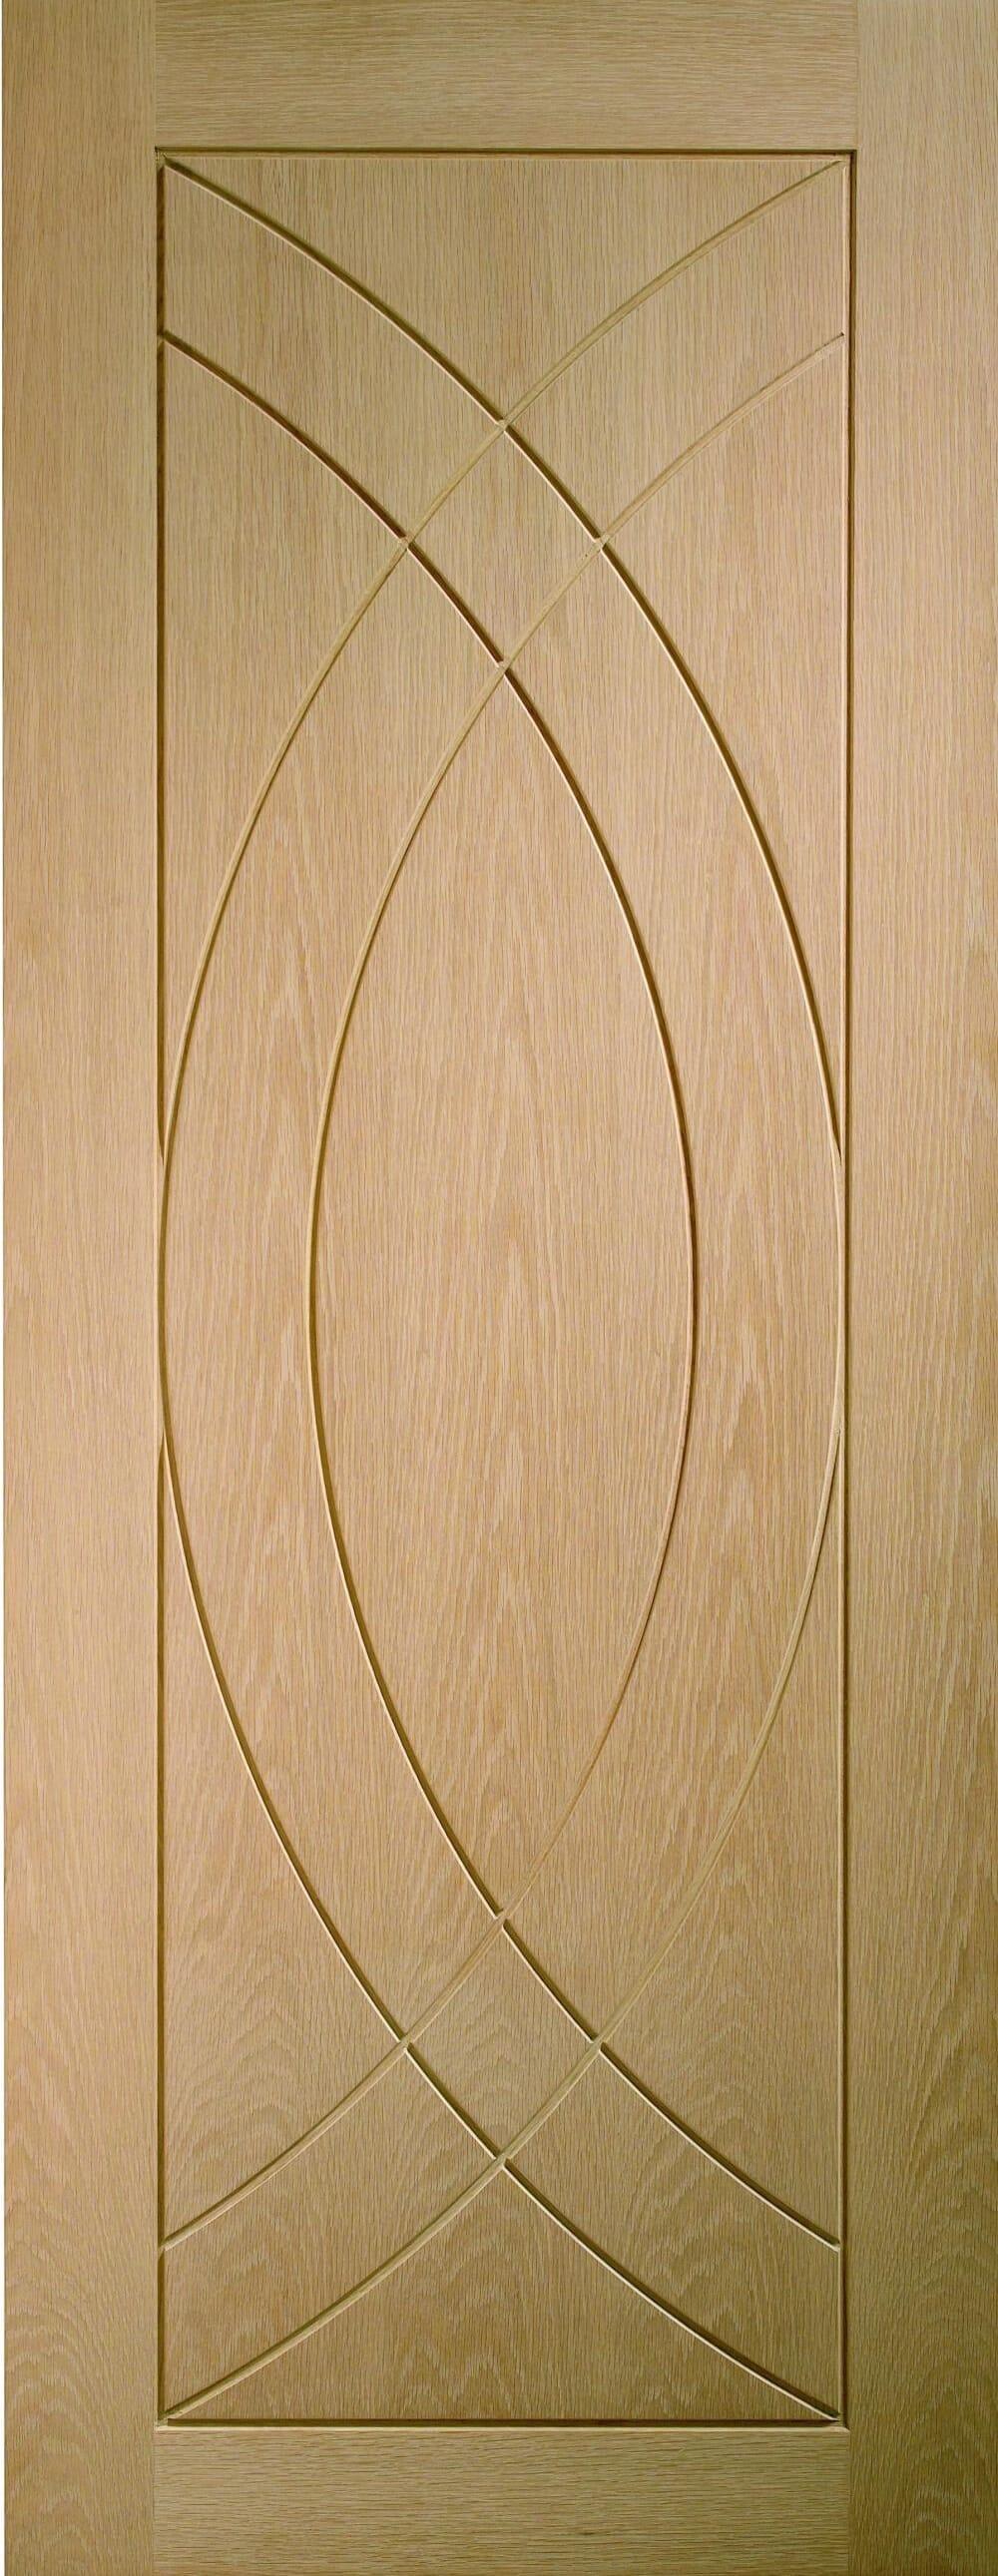 Treviso Oak - Prefinished Image